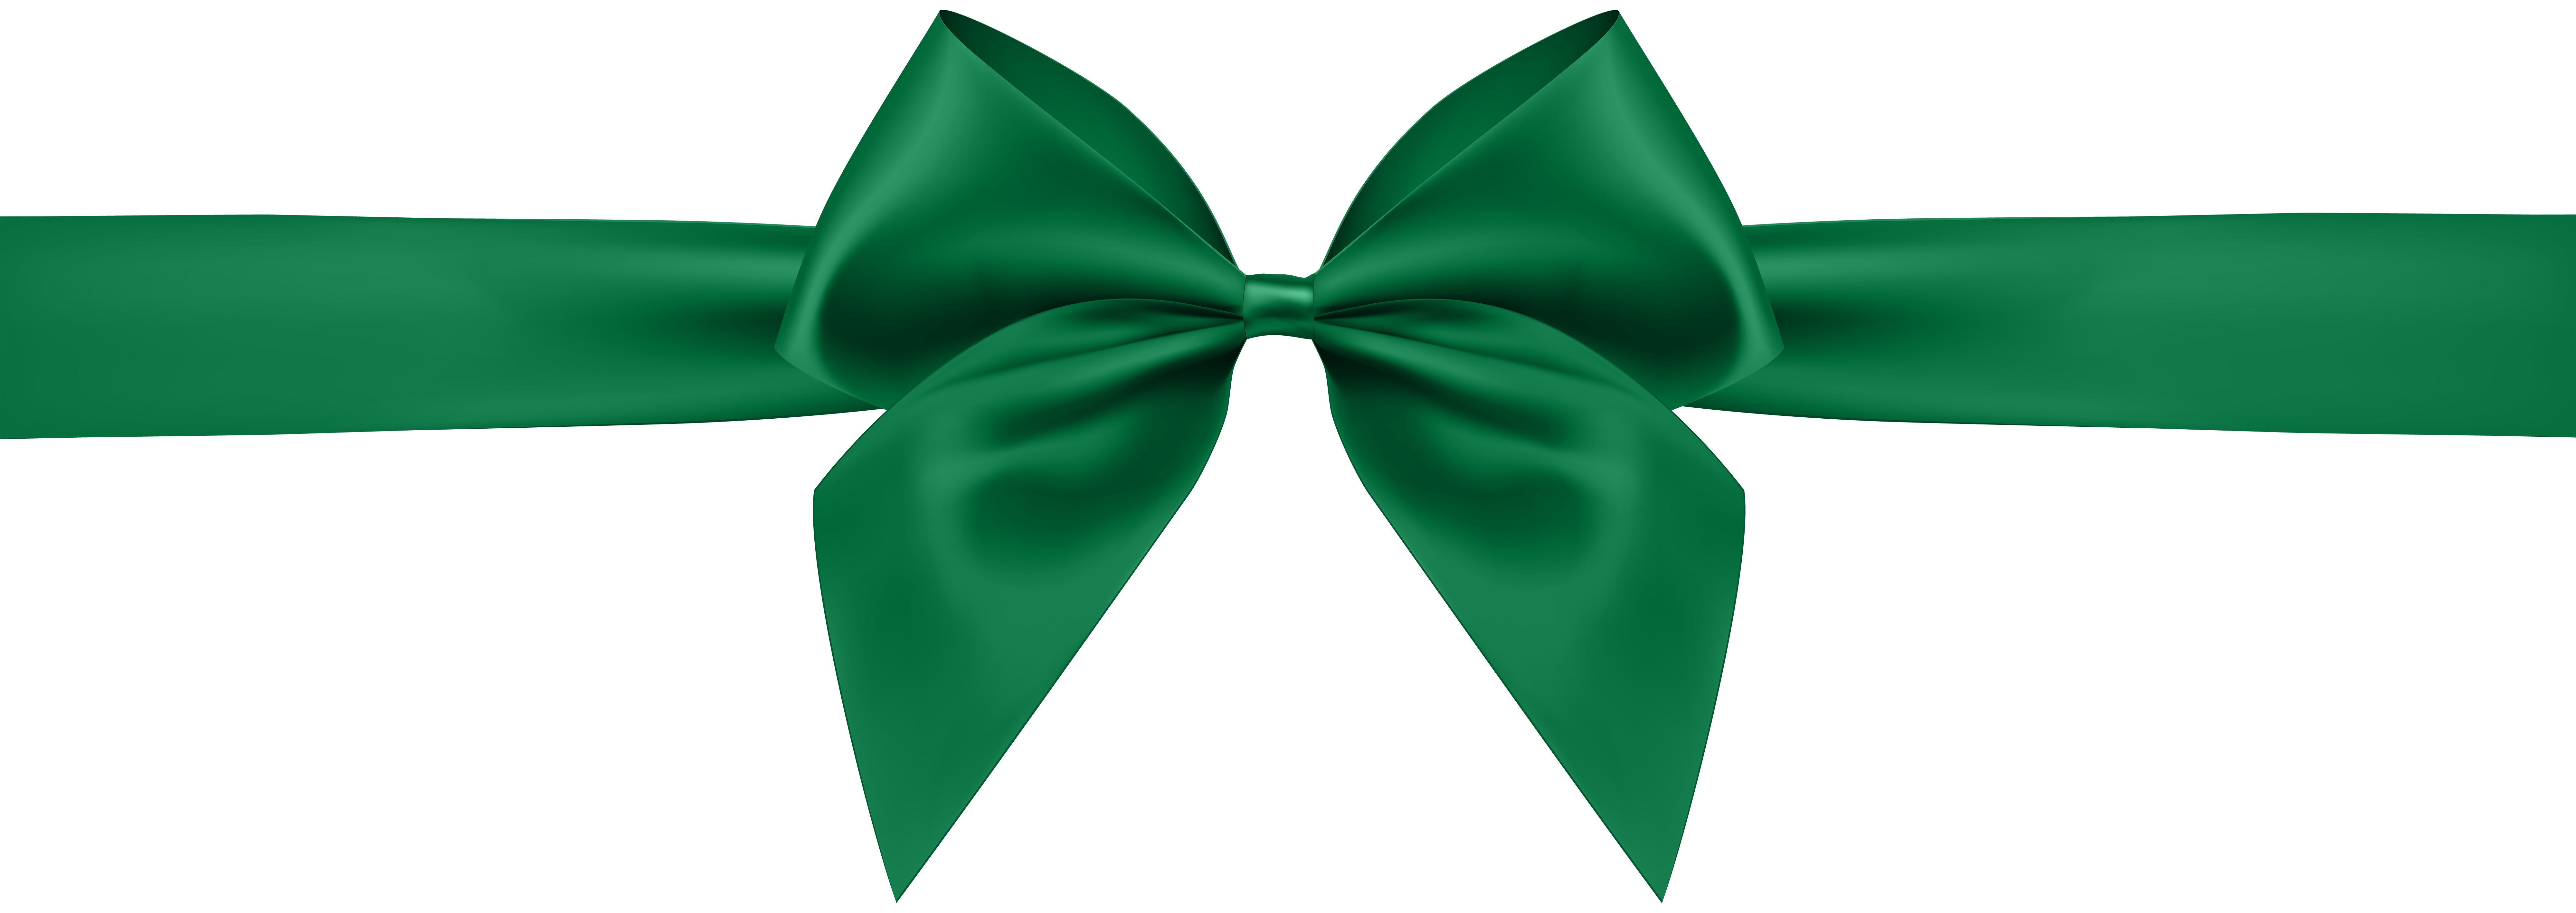 Transparent clip art image. Clipart bow light green